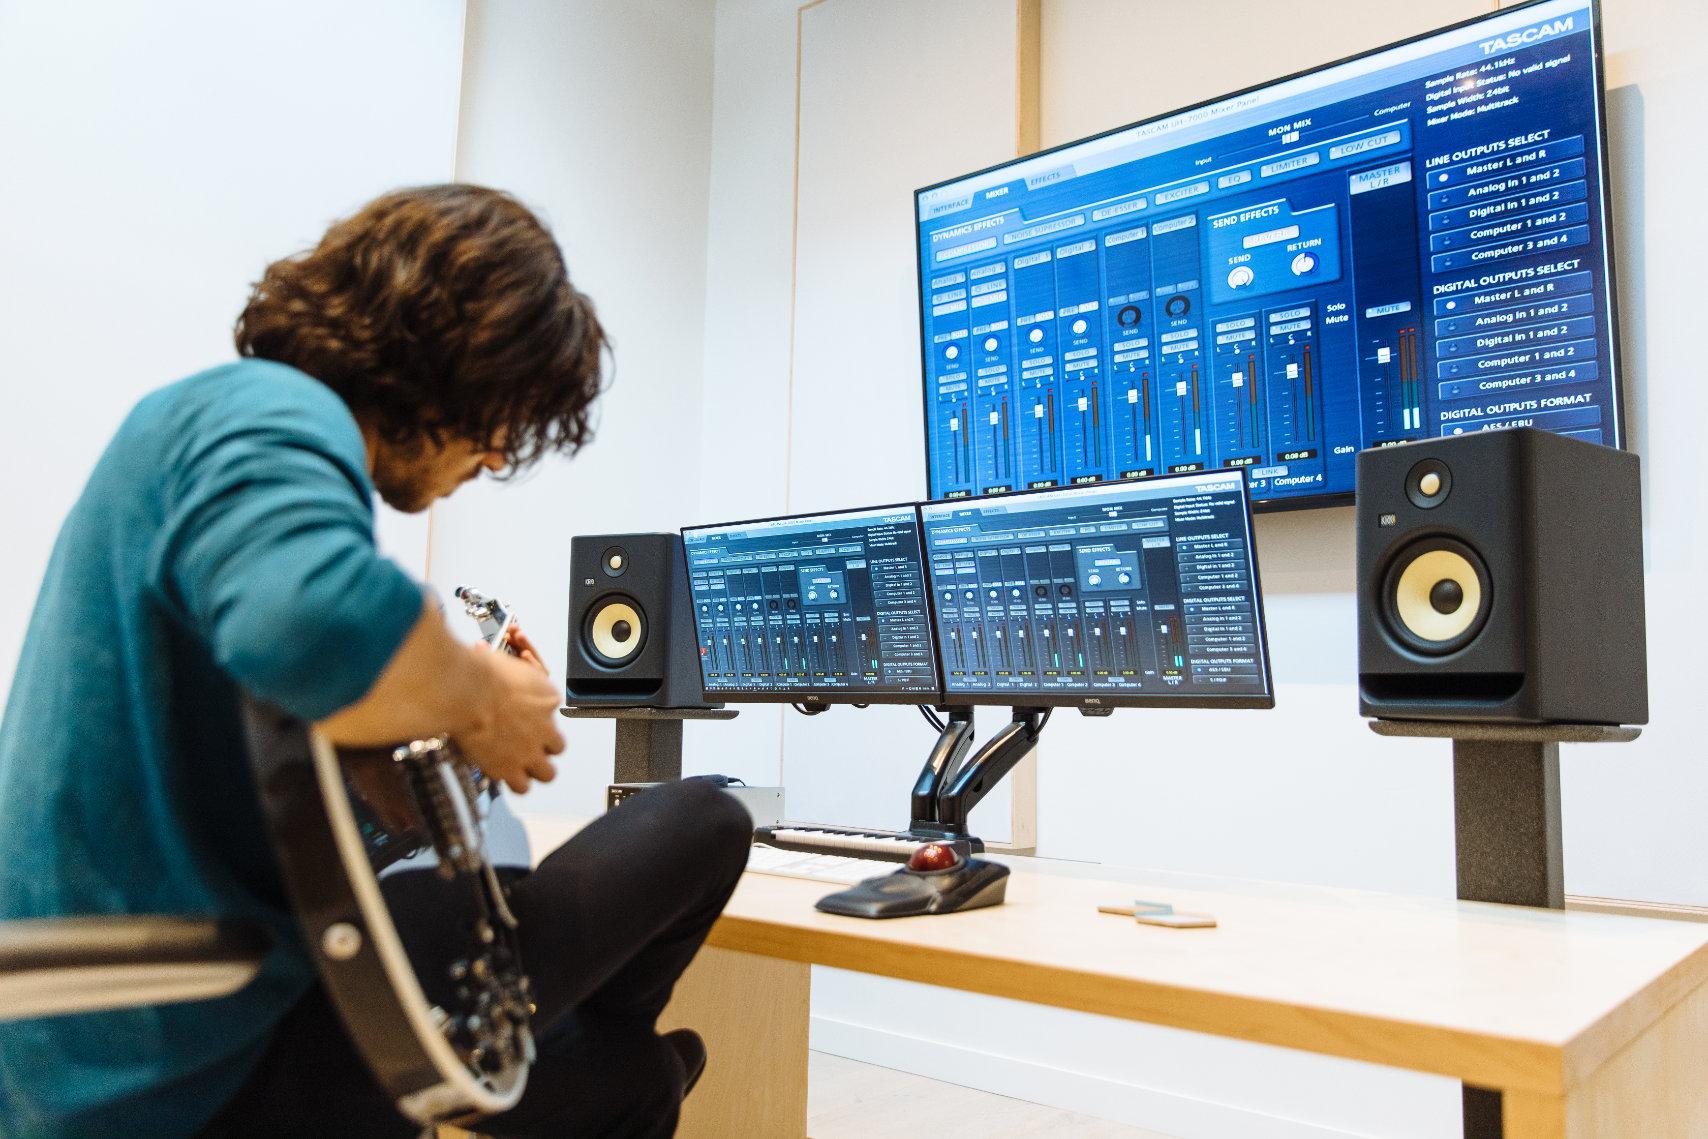 KRK ROKIT G4 Studio